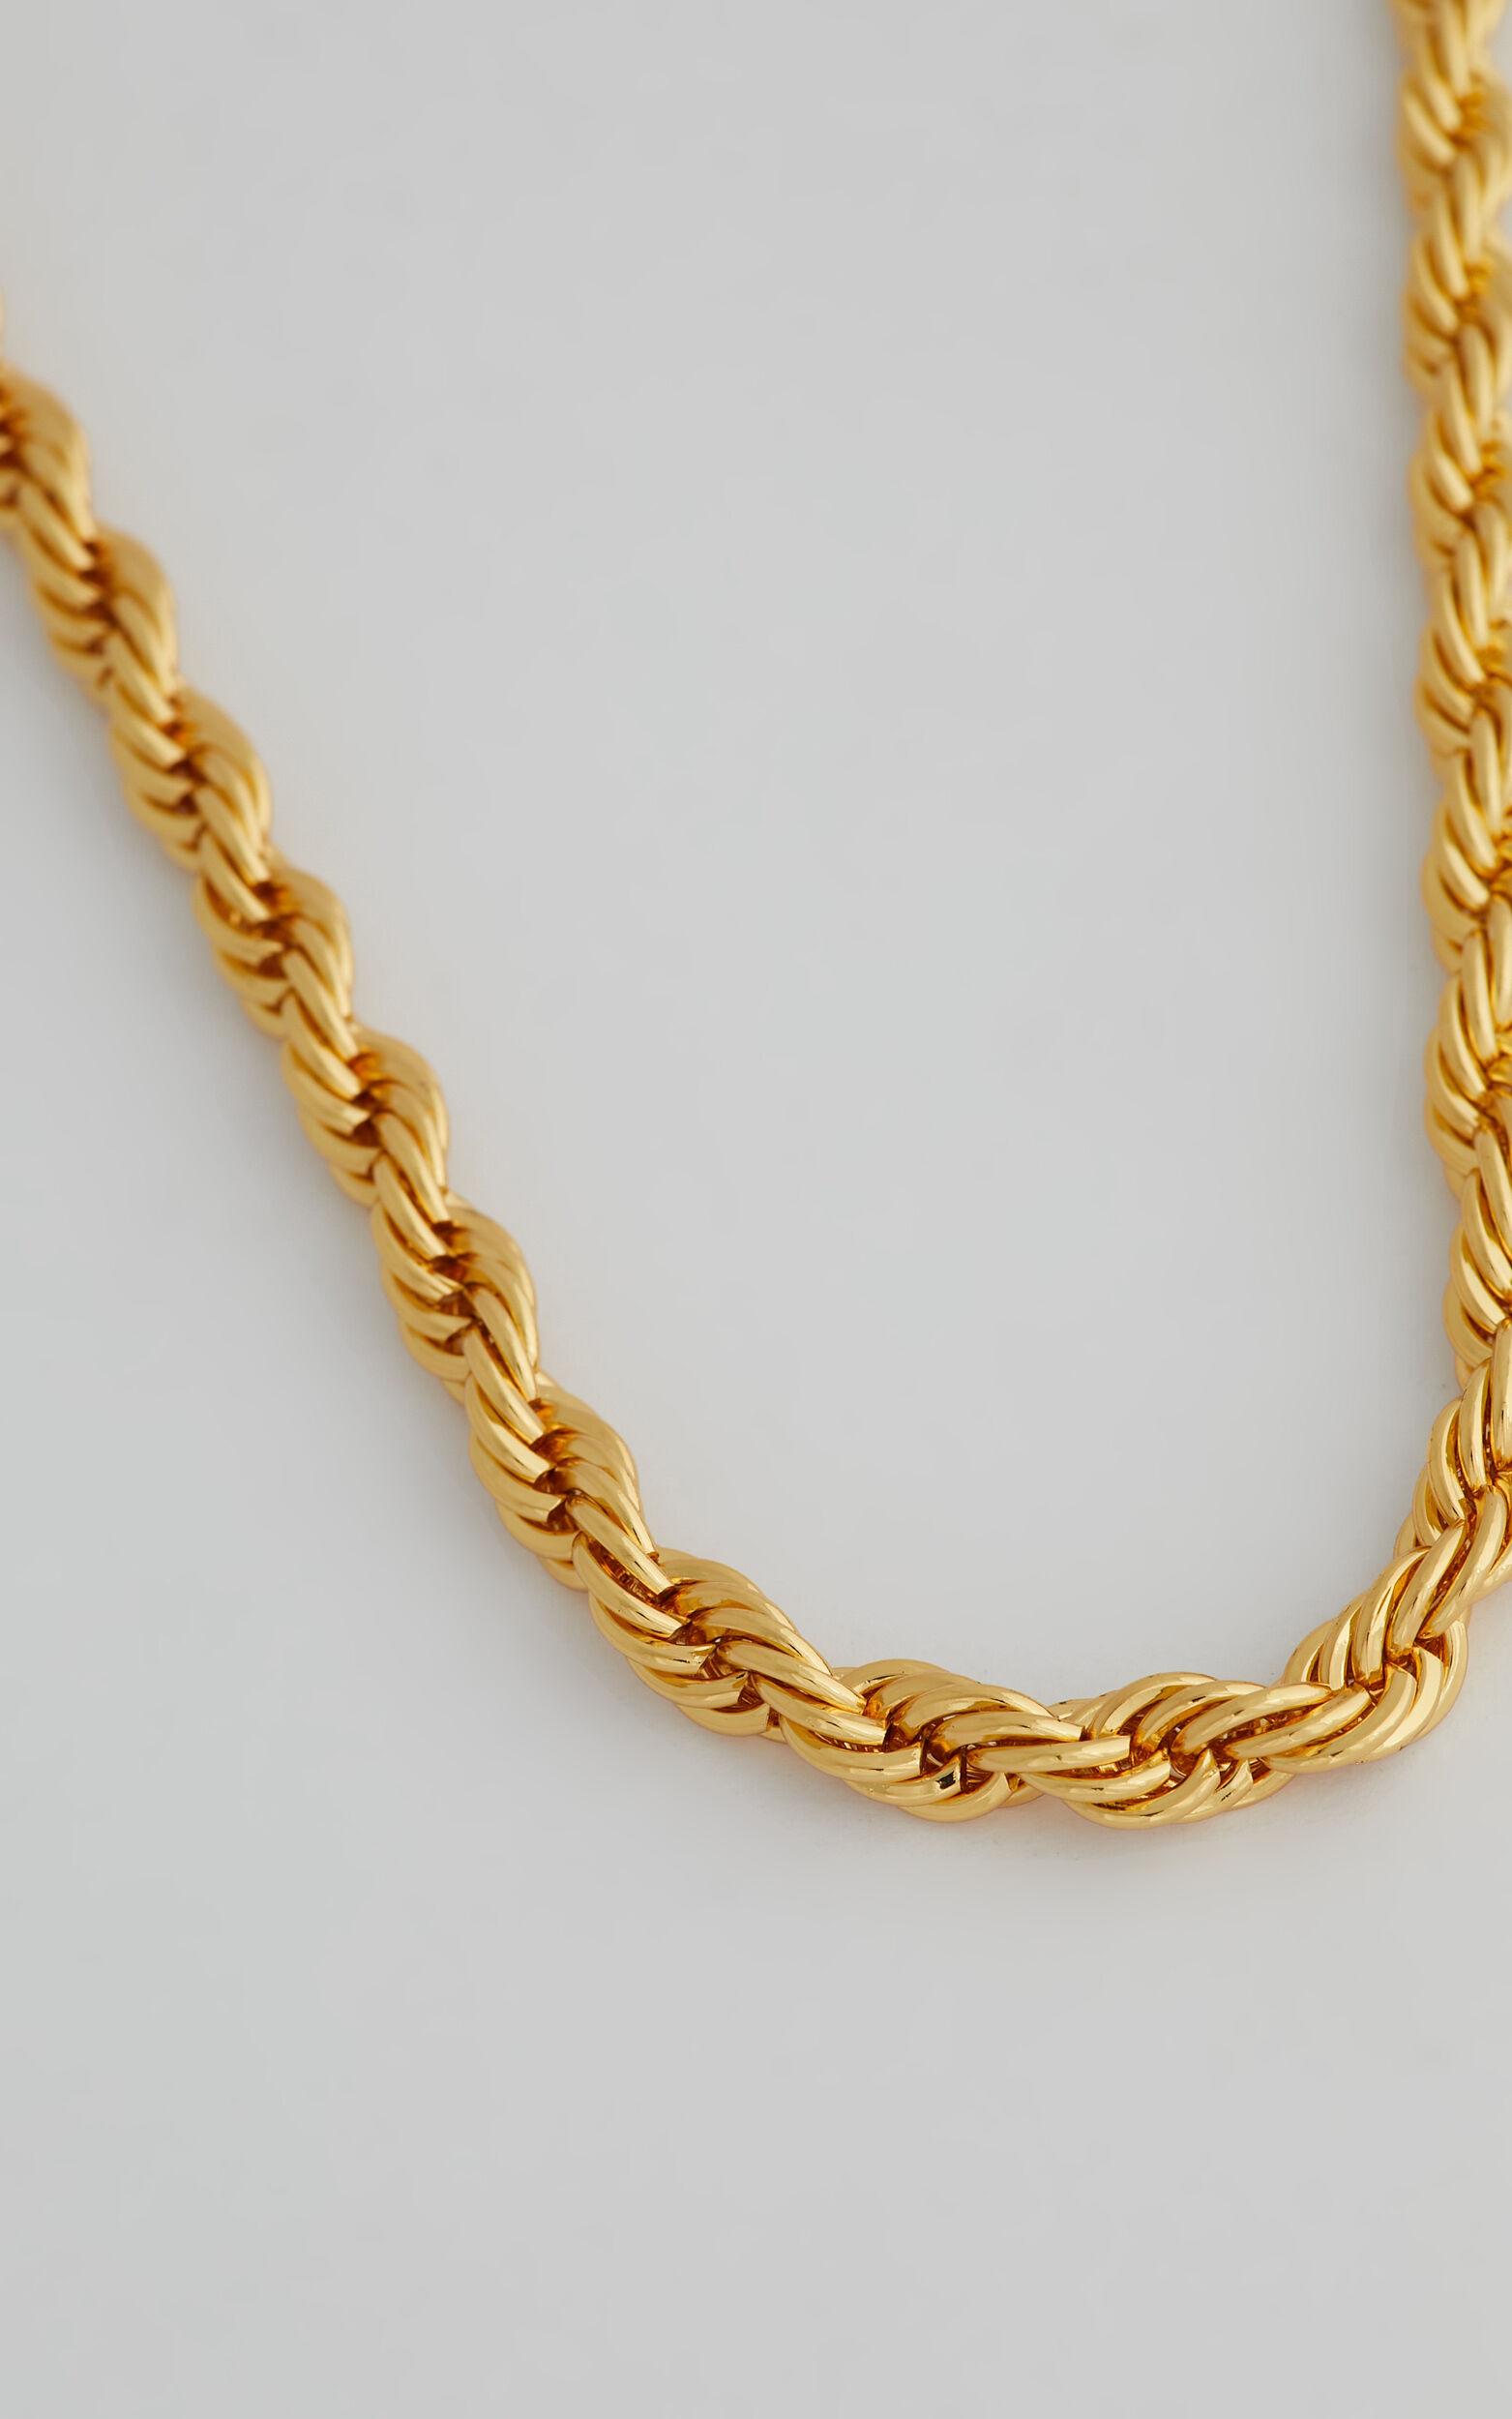 Vivi Chain Necklace in Gold - NoSize, GLD1, super-hi-res image number null